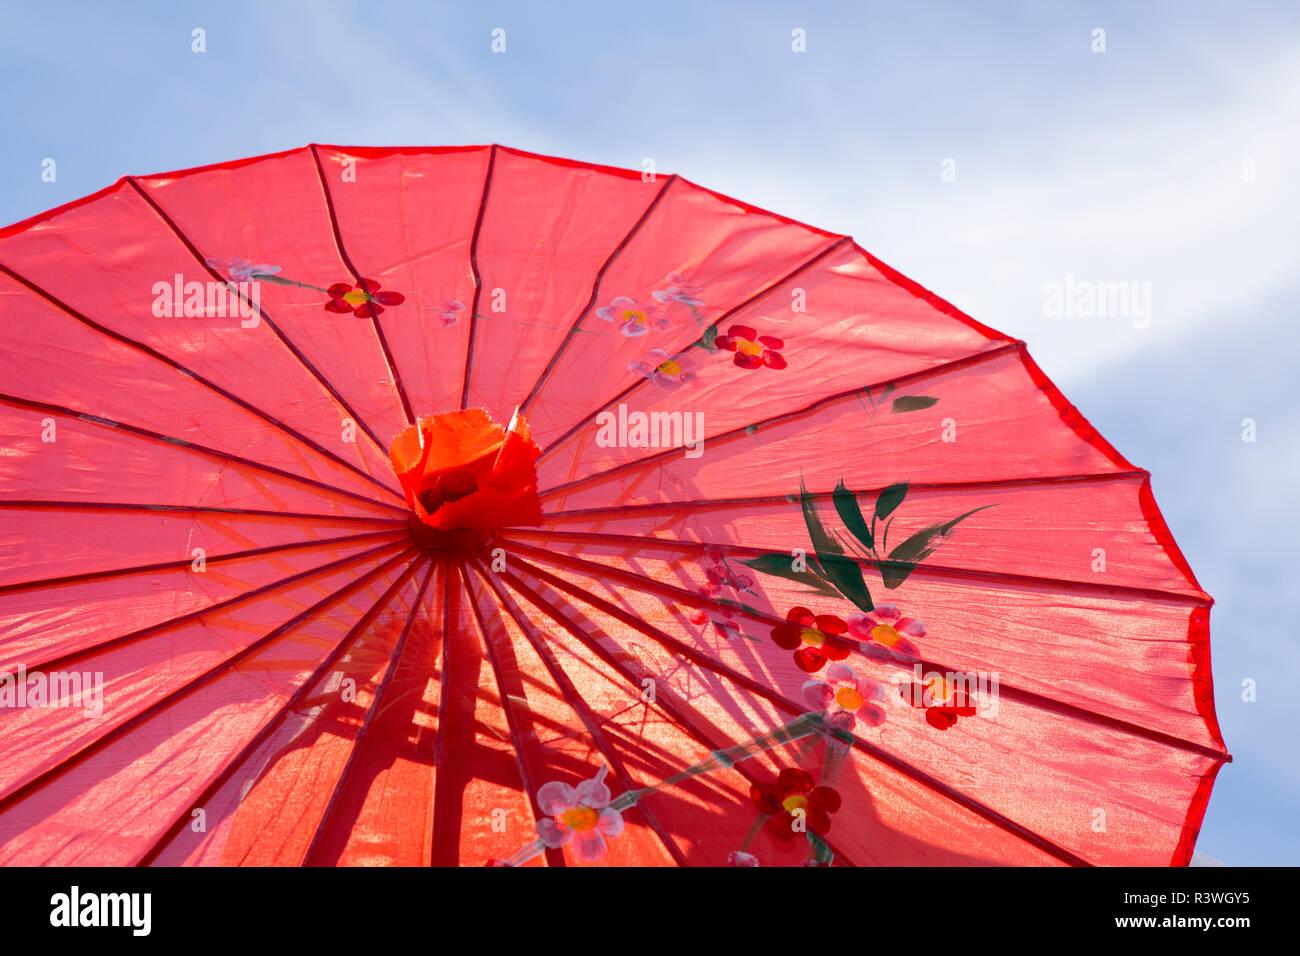 USA, Arizona, Phoenix. Close-up of Chinese parasol. Credit as: Wendy Kaveney / Jaynes Gallery / DanitaDelimont.com Stock Photo